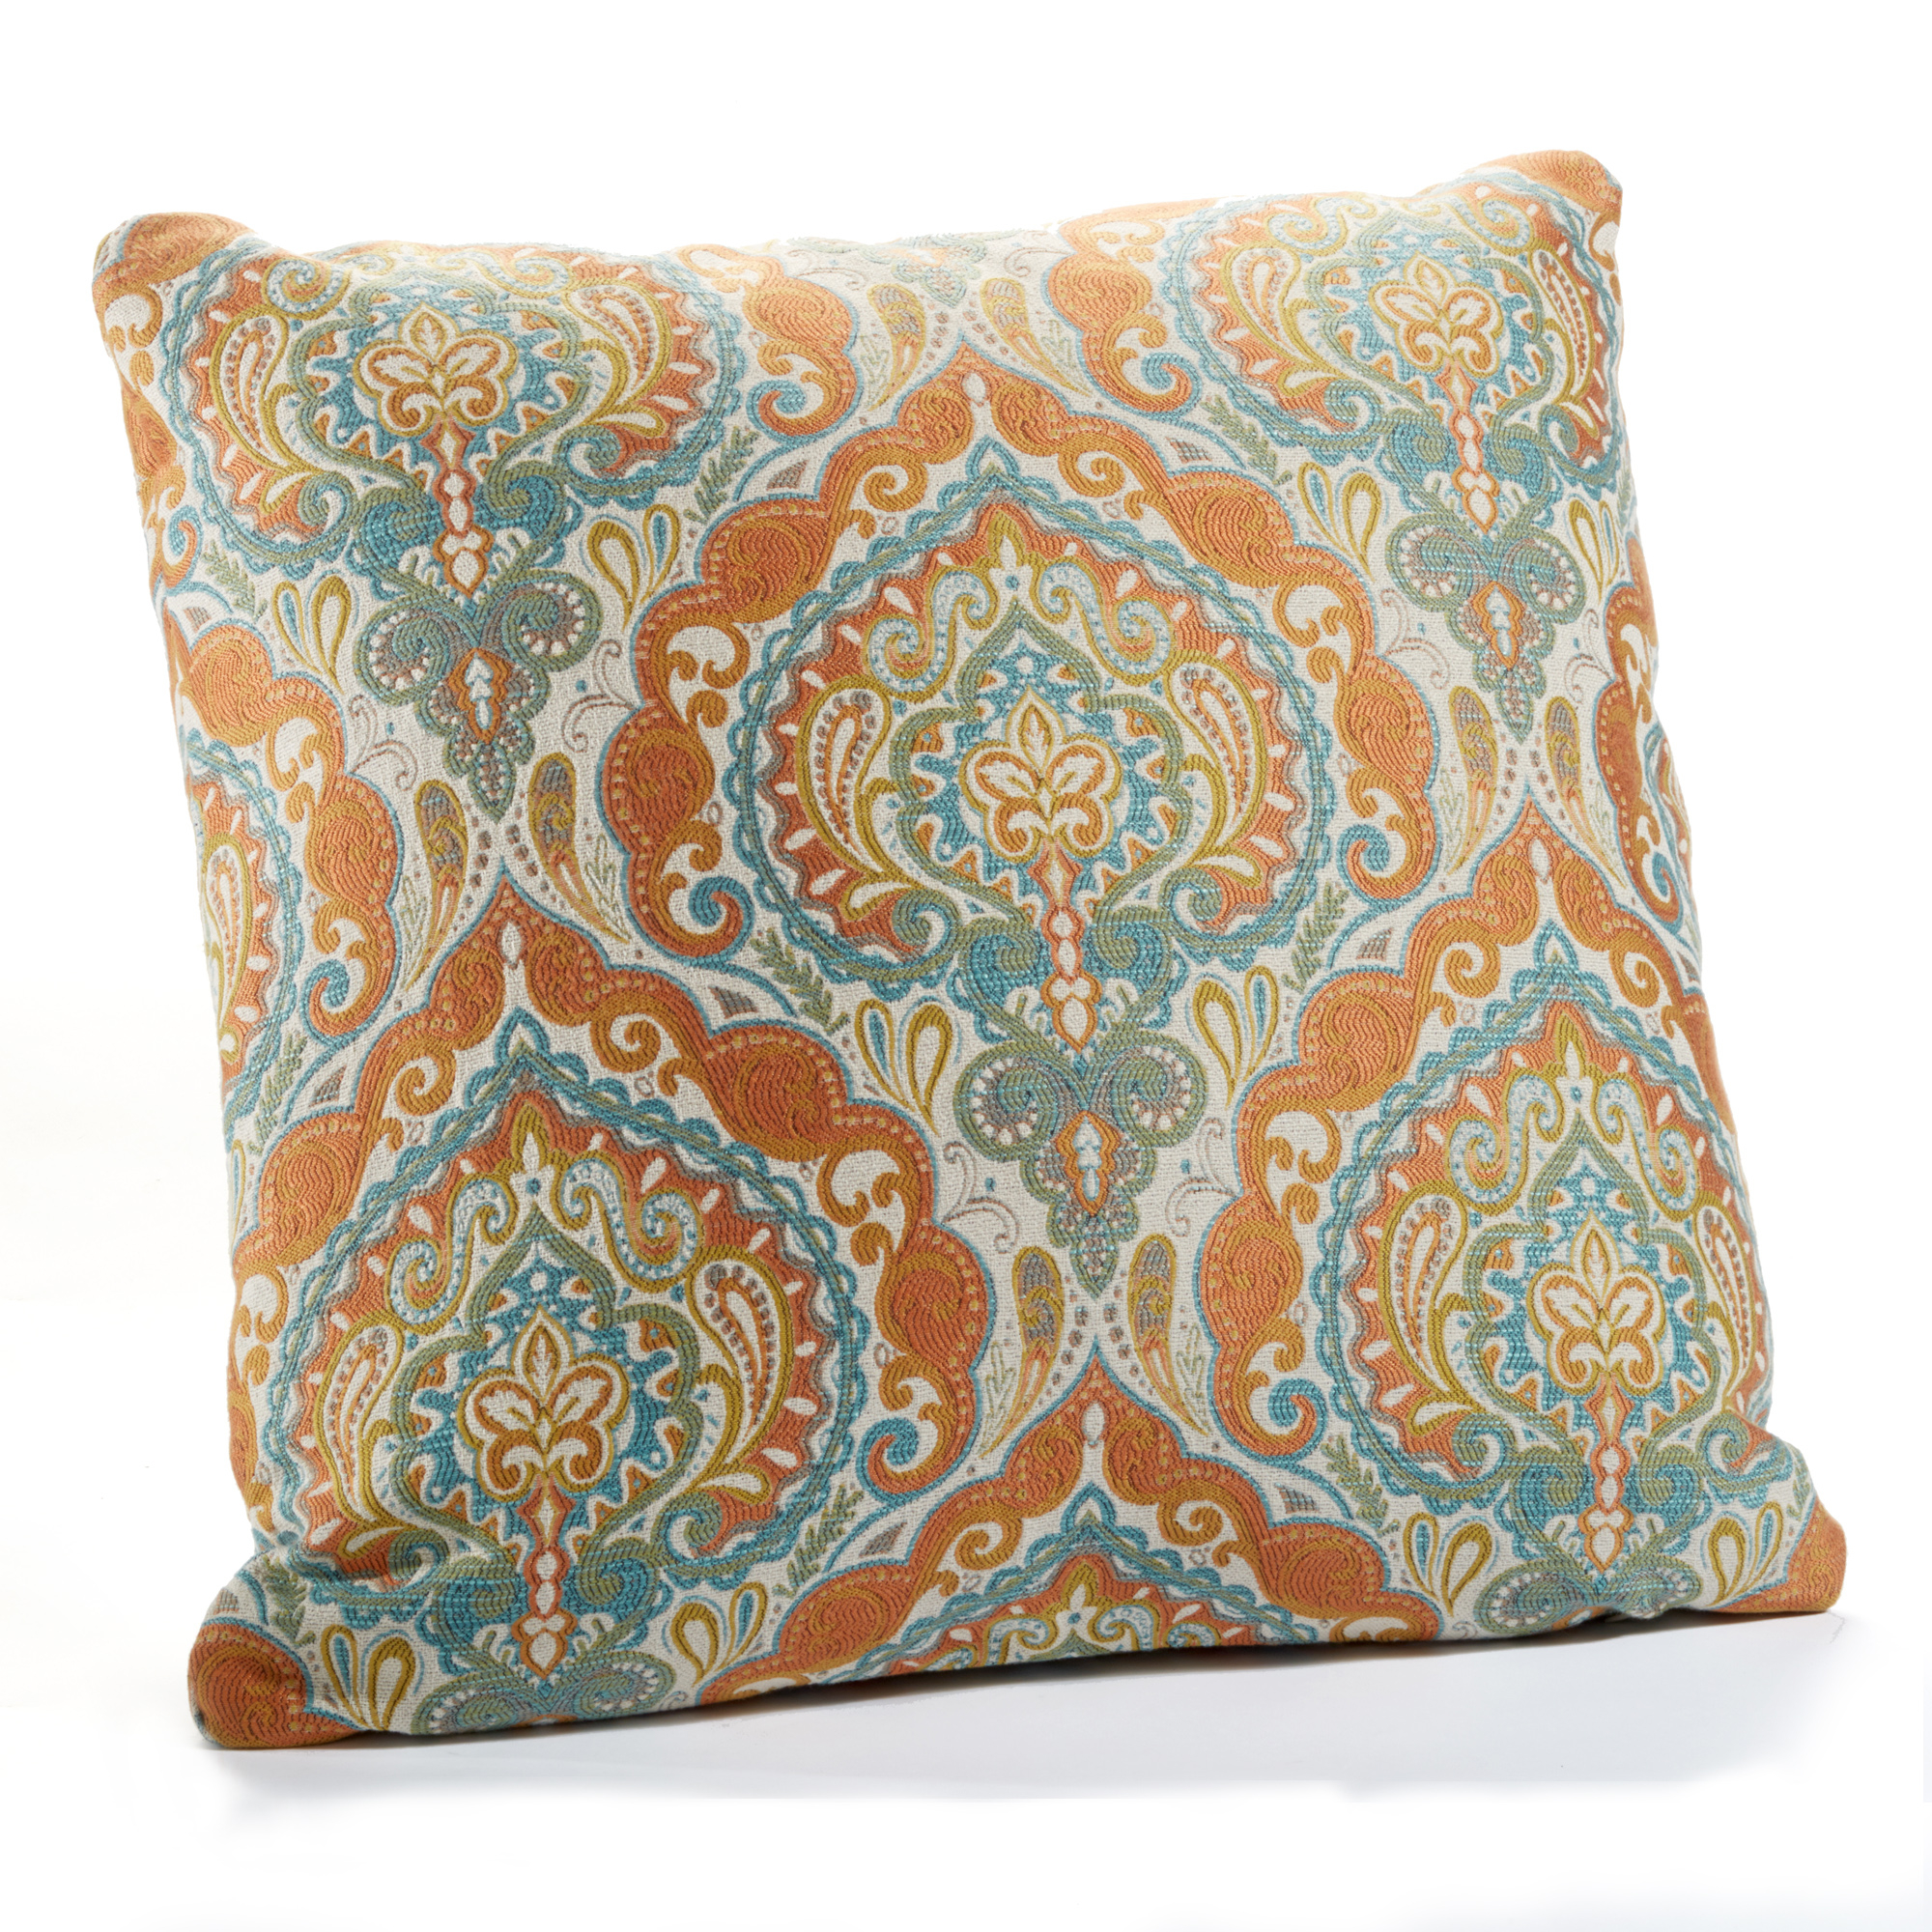 Throw Pillows Home : Miramar Medallion Pillow Gump s